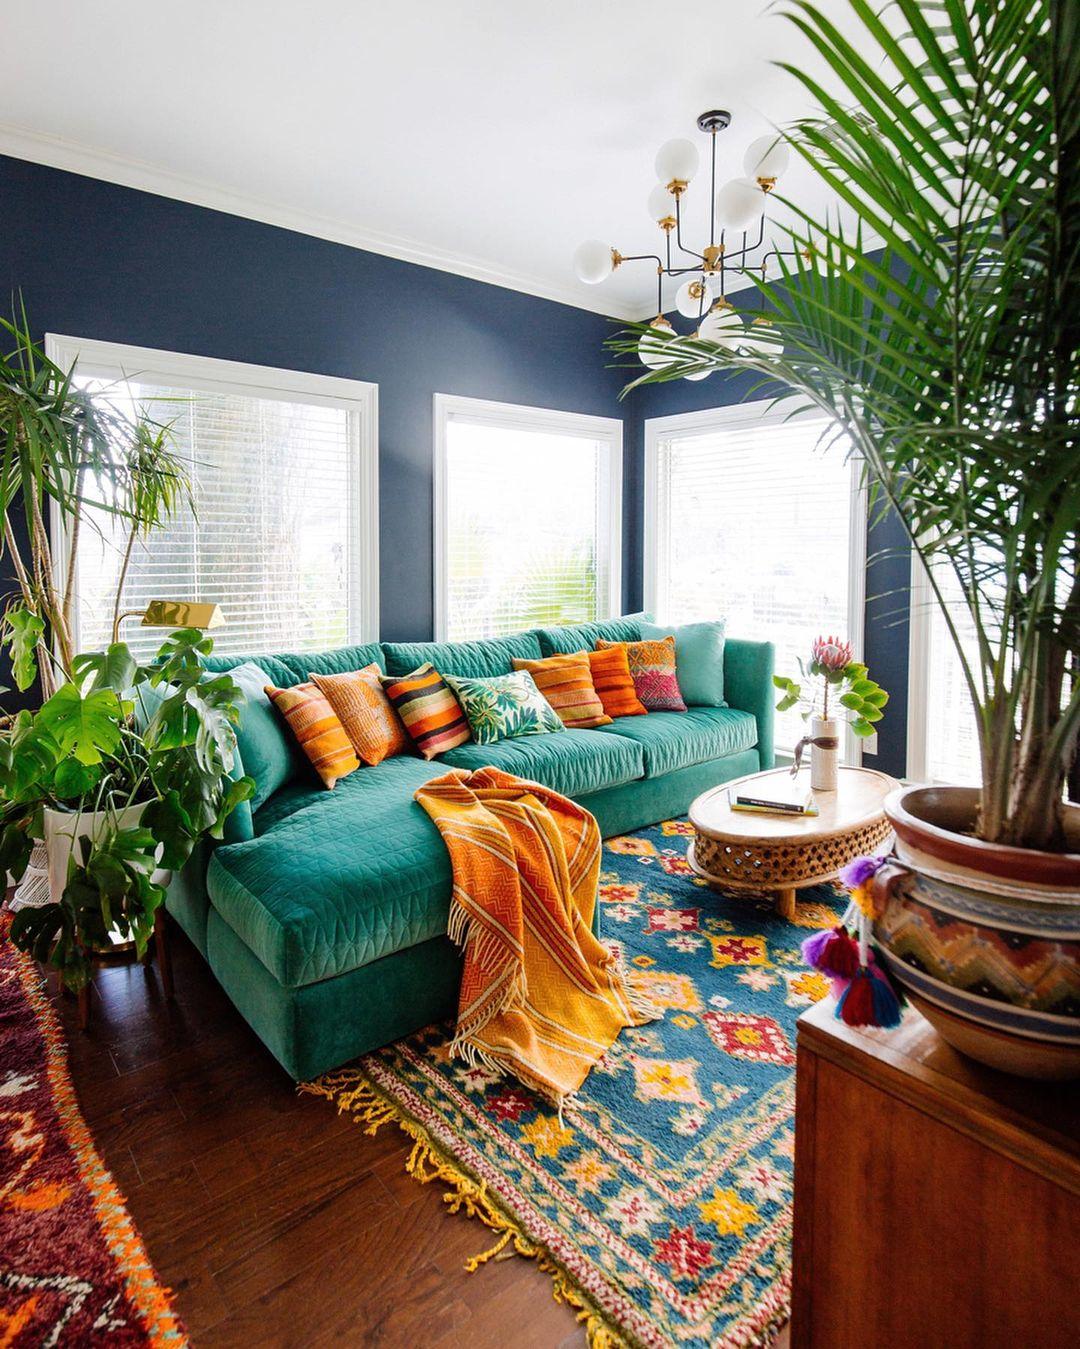 Vivid L Shape Sofa Ideas for Living Room